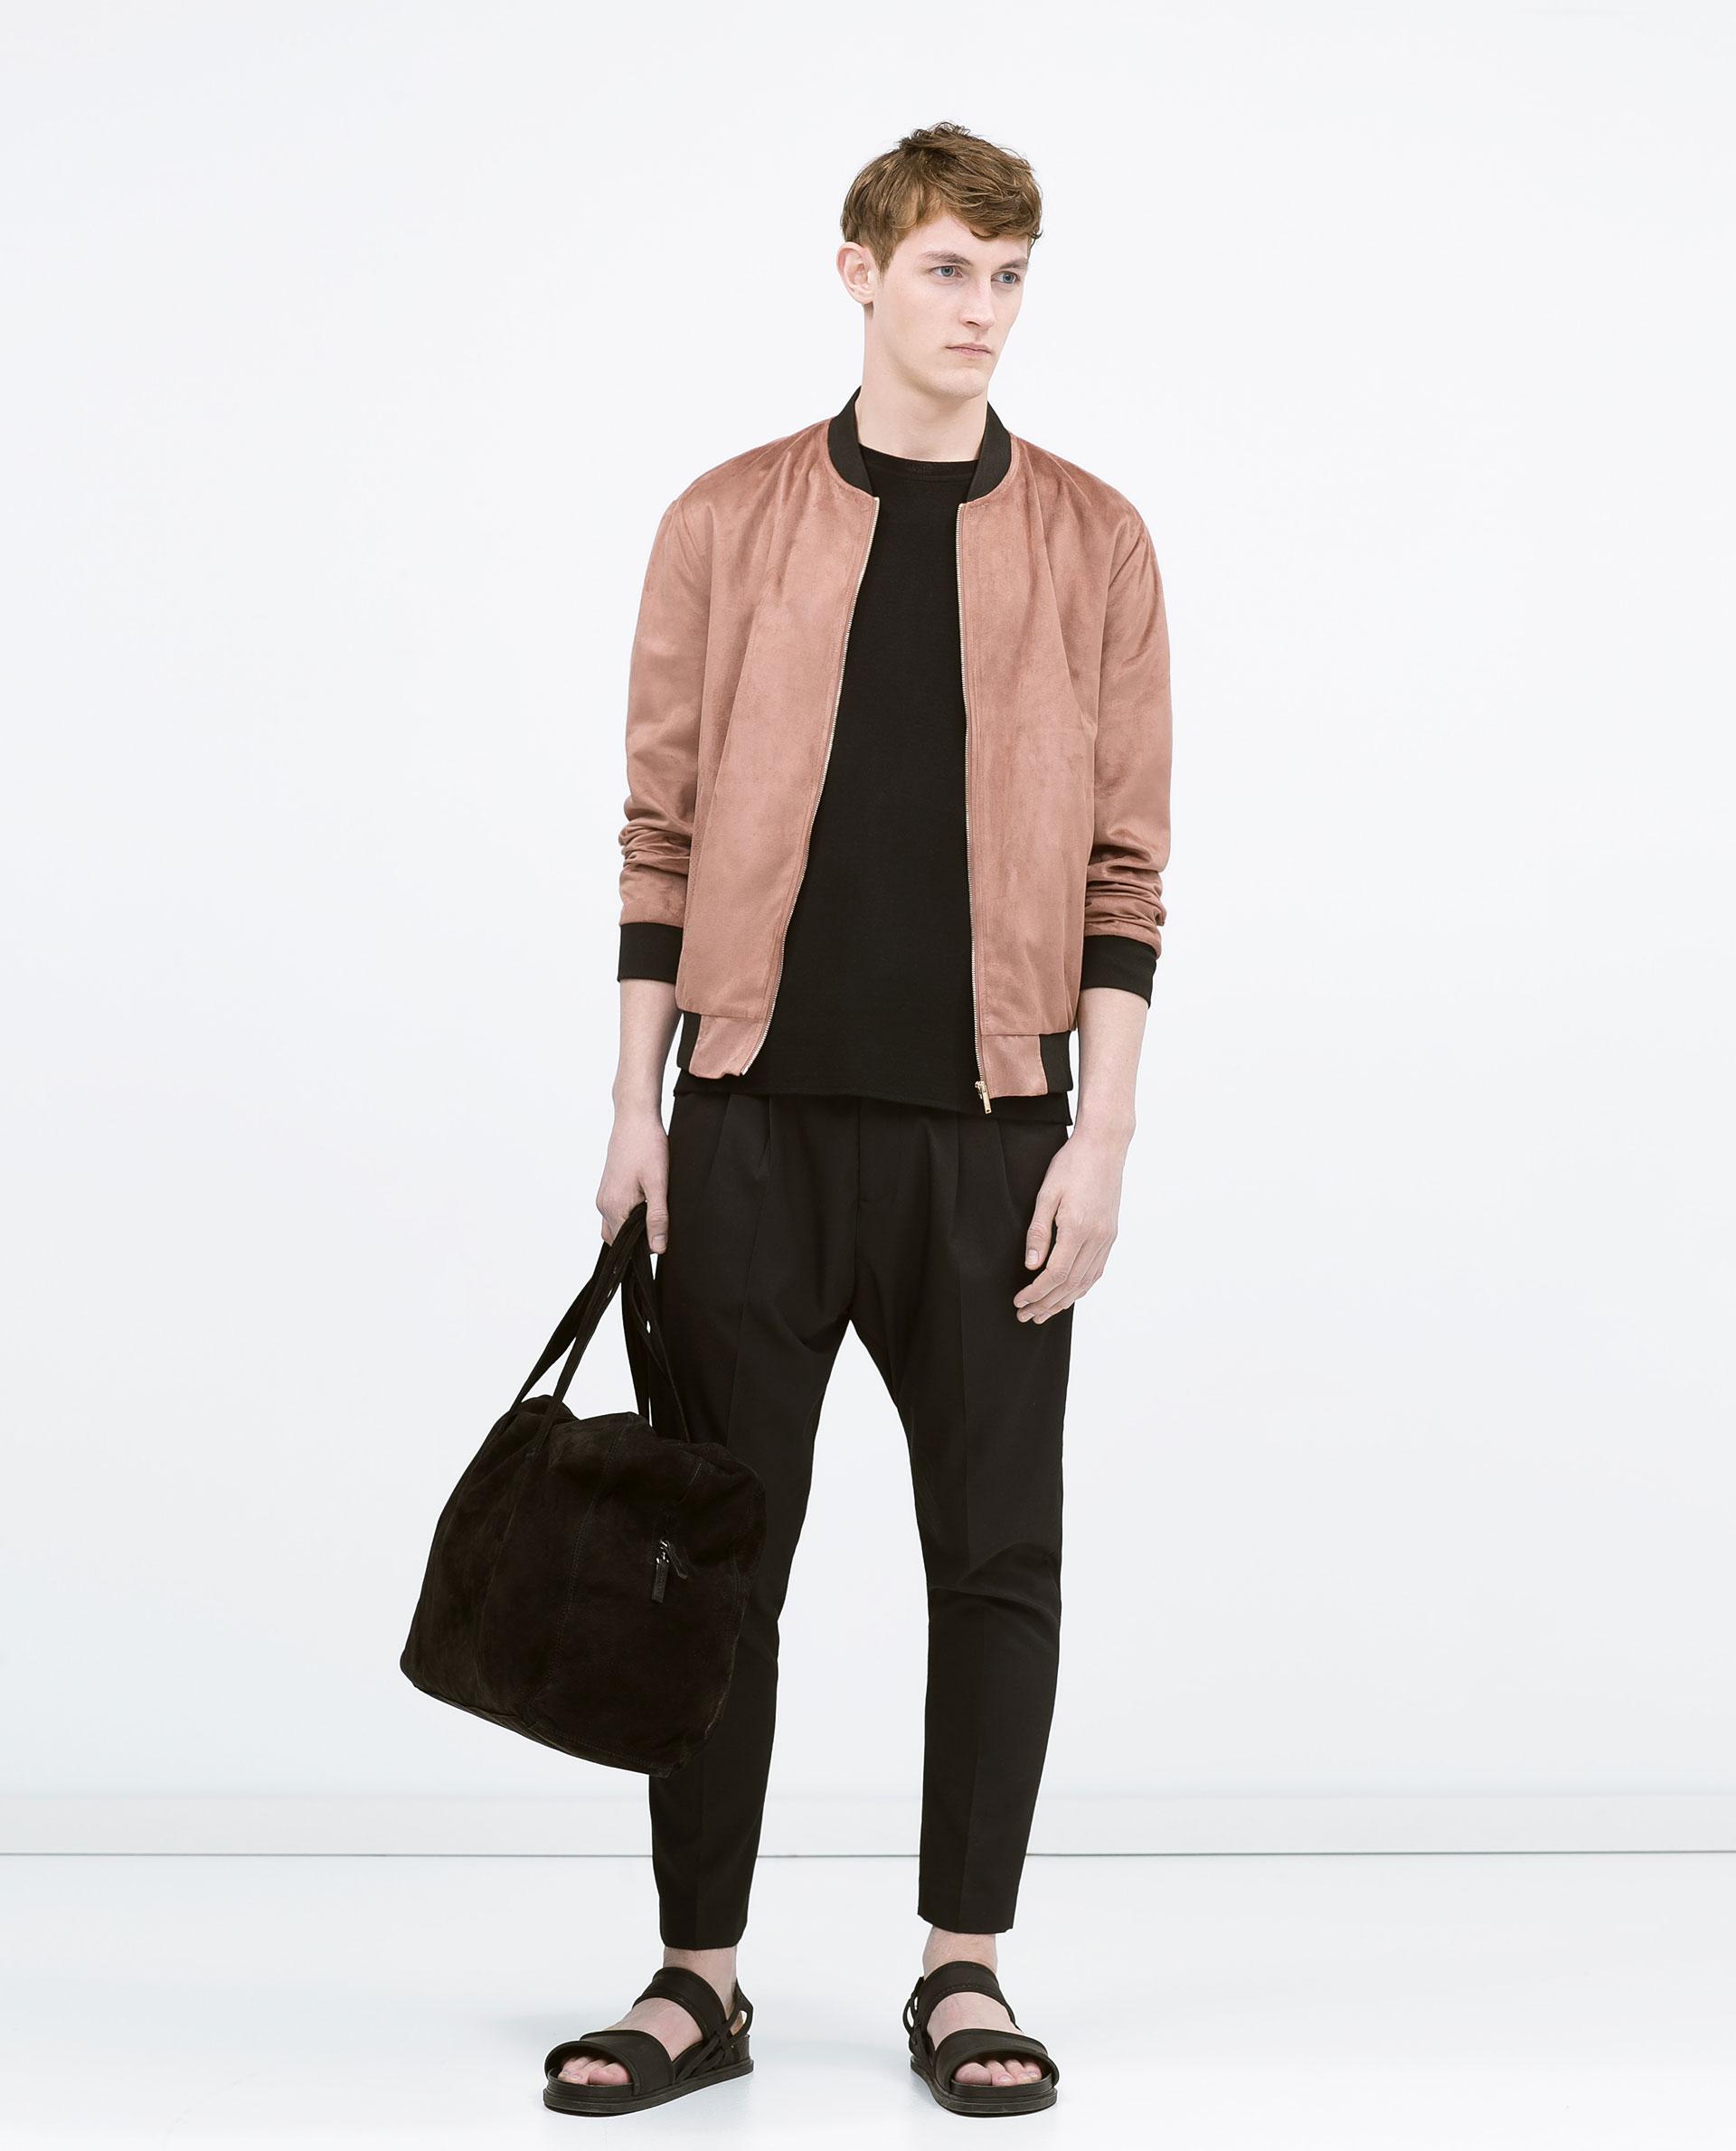 b8a7b6d9 10 Summer Jackets For Men From Zara The Fashion Supernova